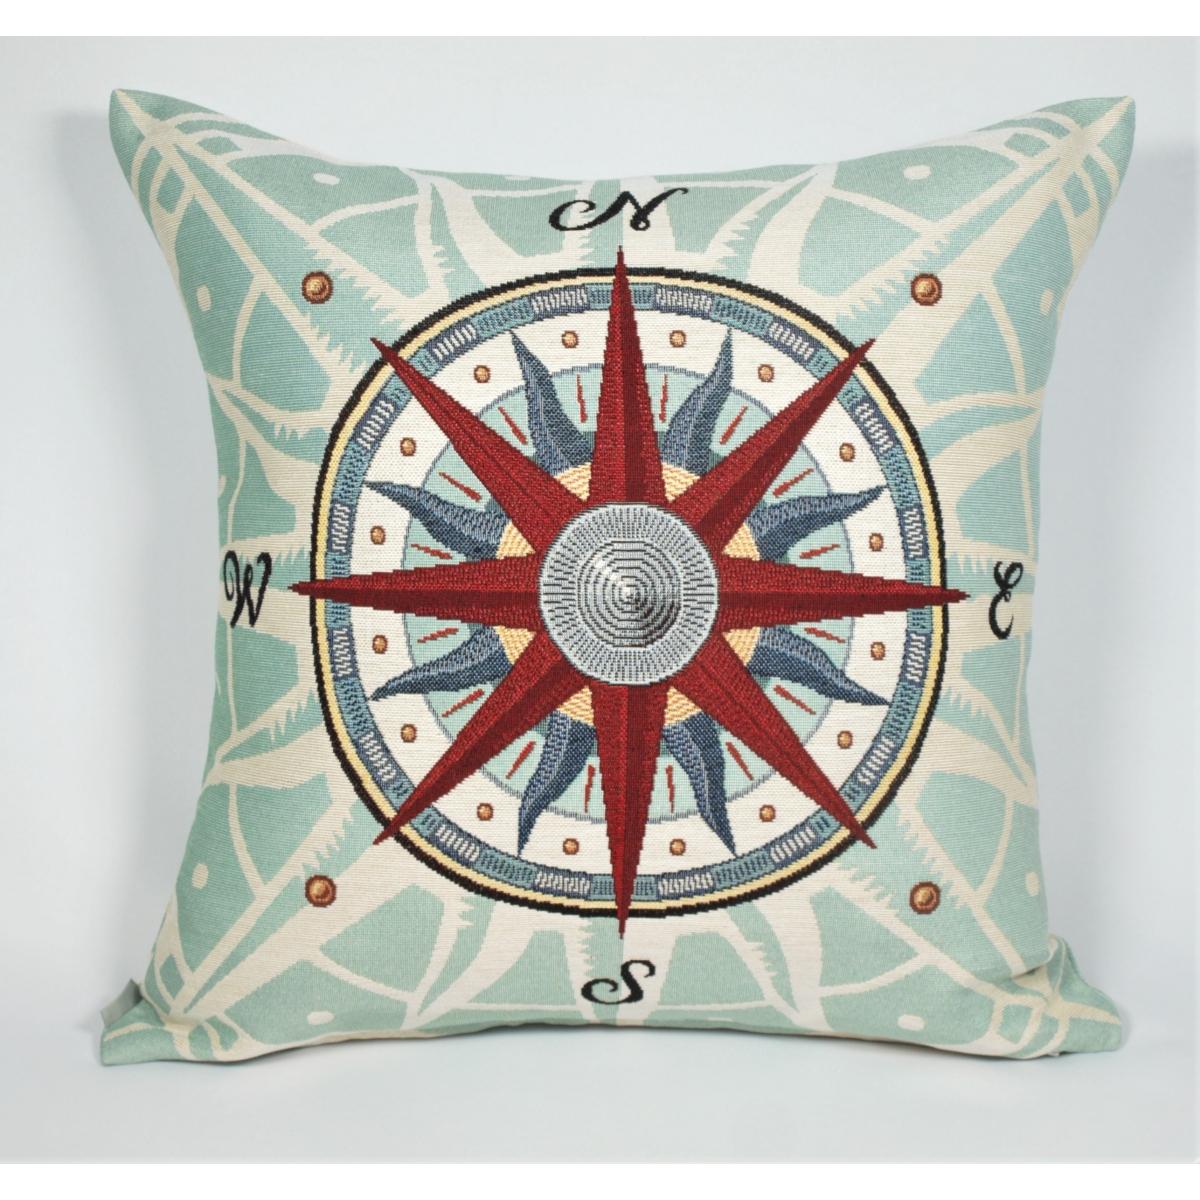 Poduszka Morska Kompas